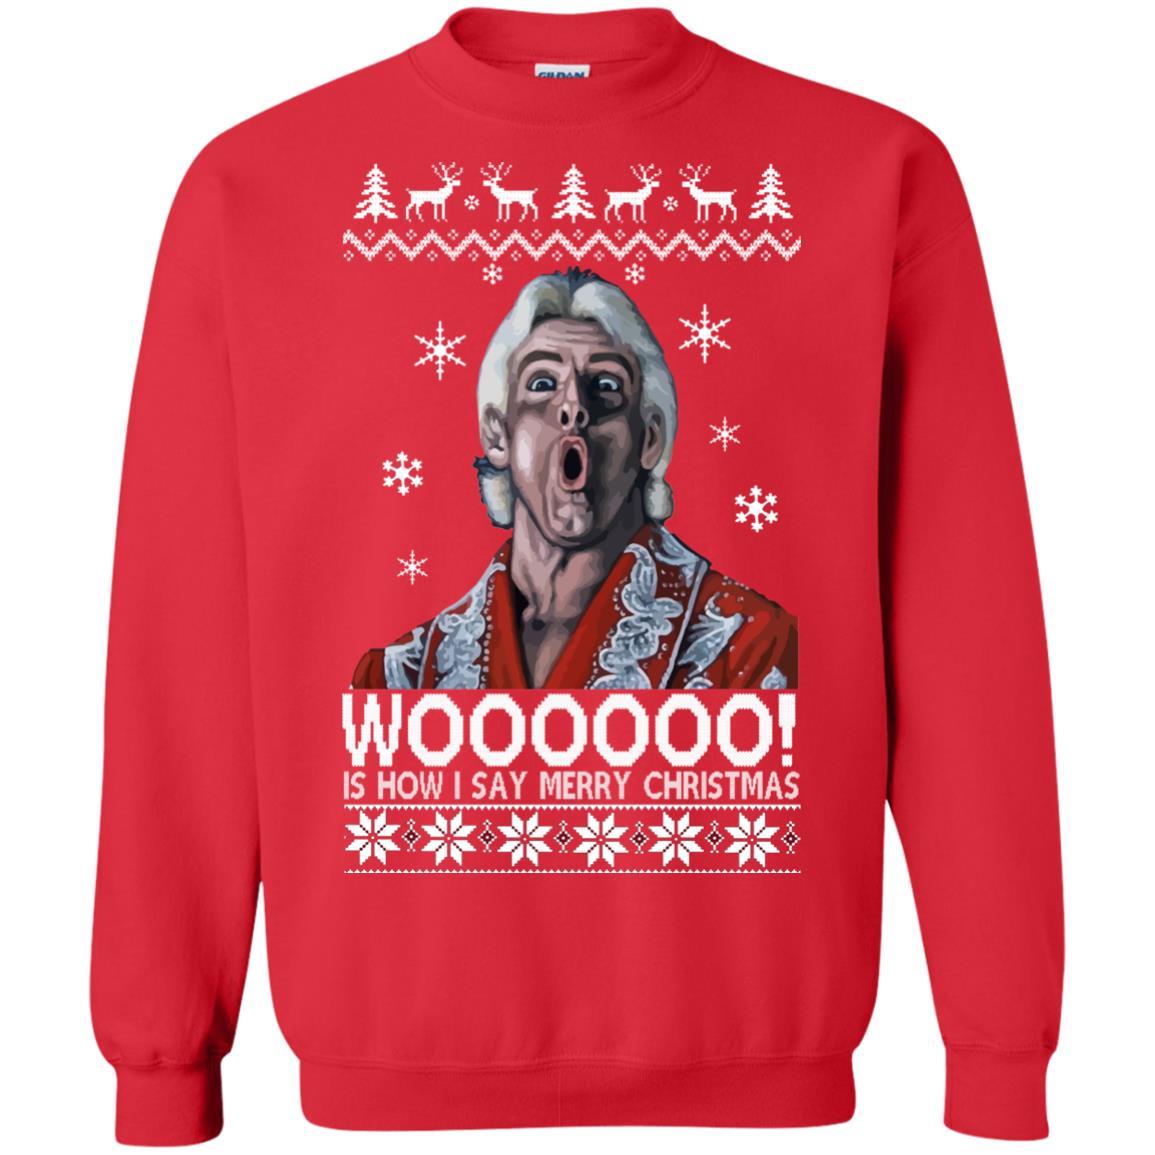 image 1643 - Green Ric Flair WOO Christmas Sweater, Ugly Sweatshirt